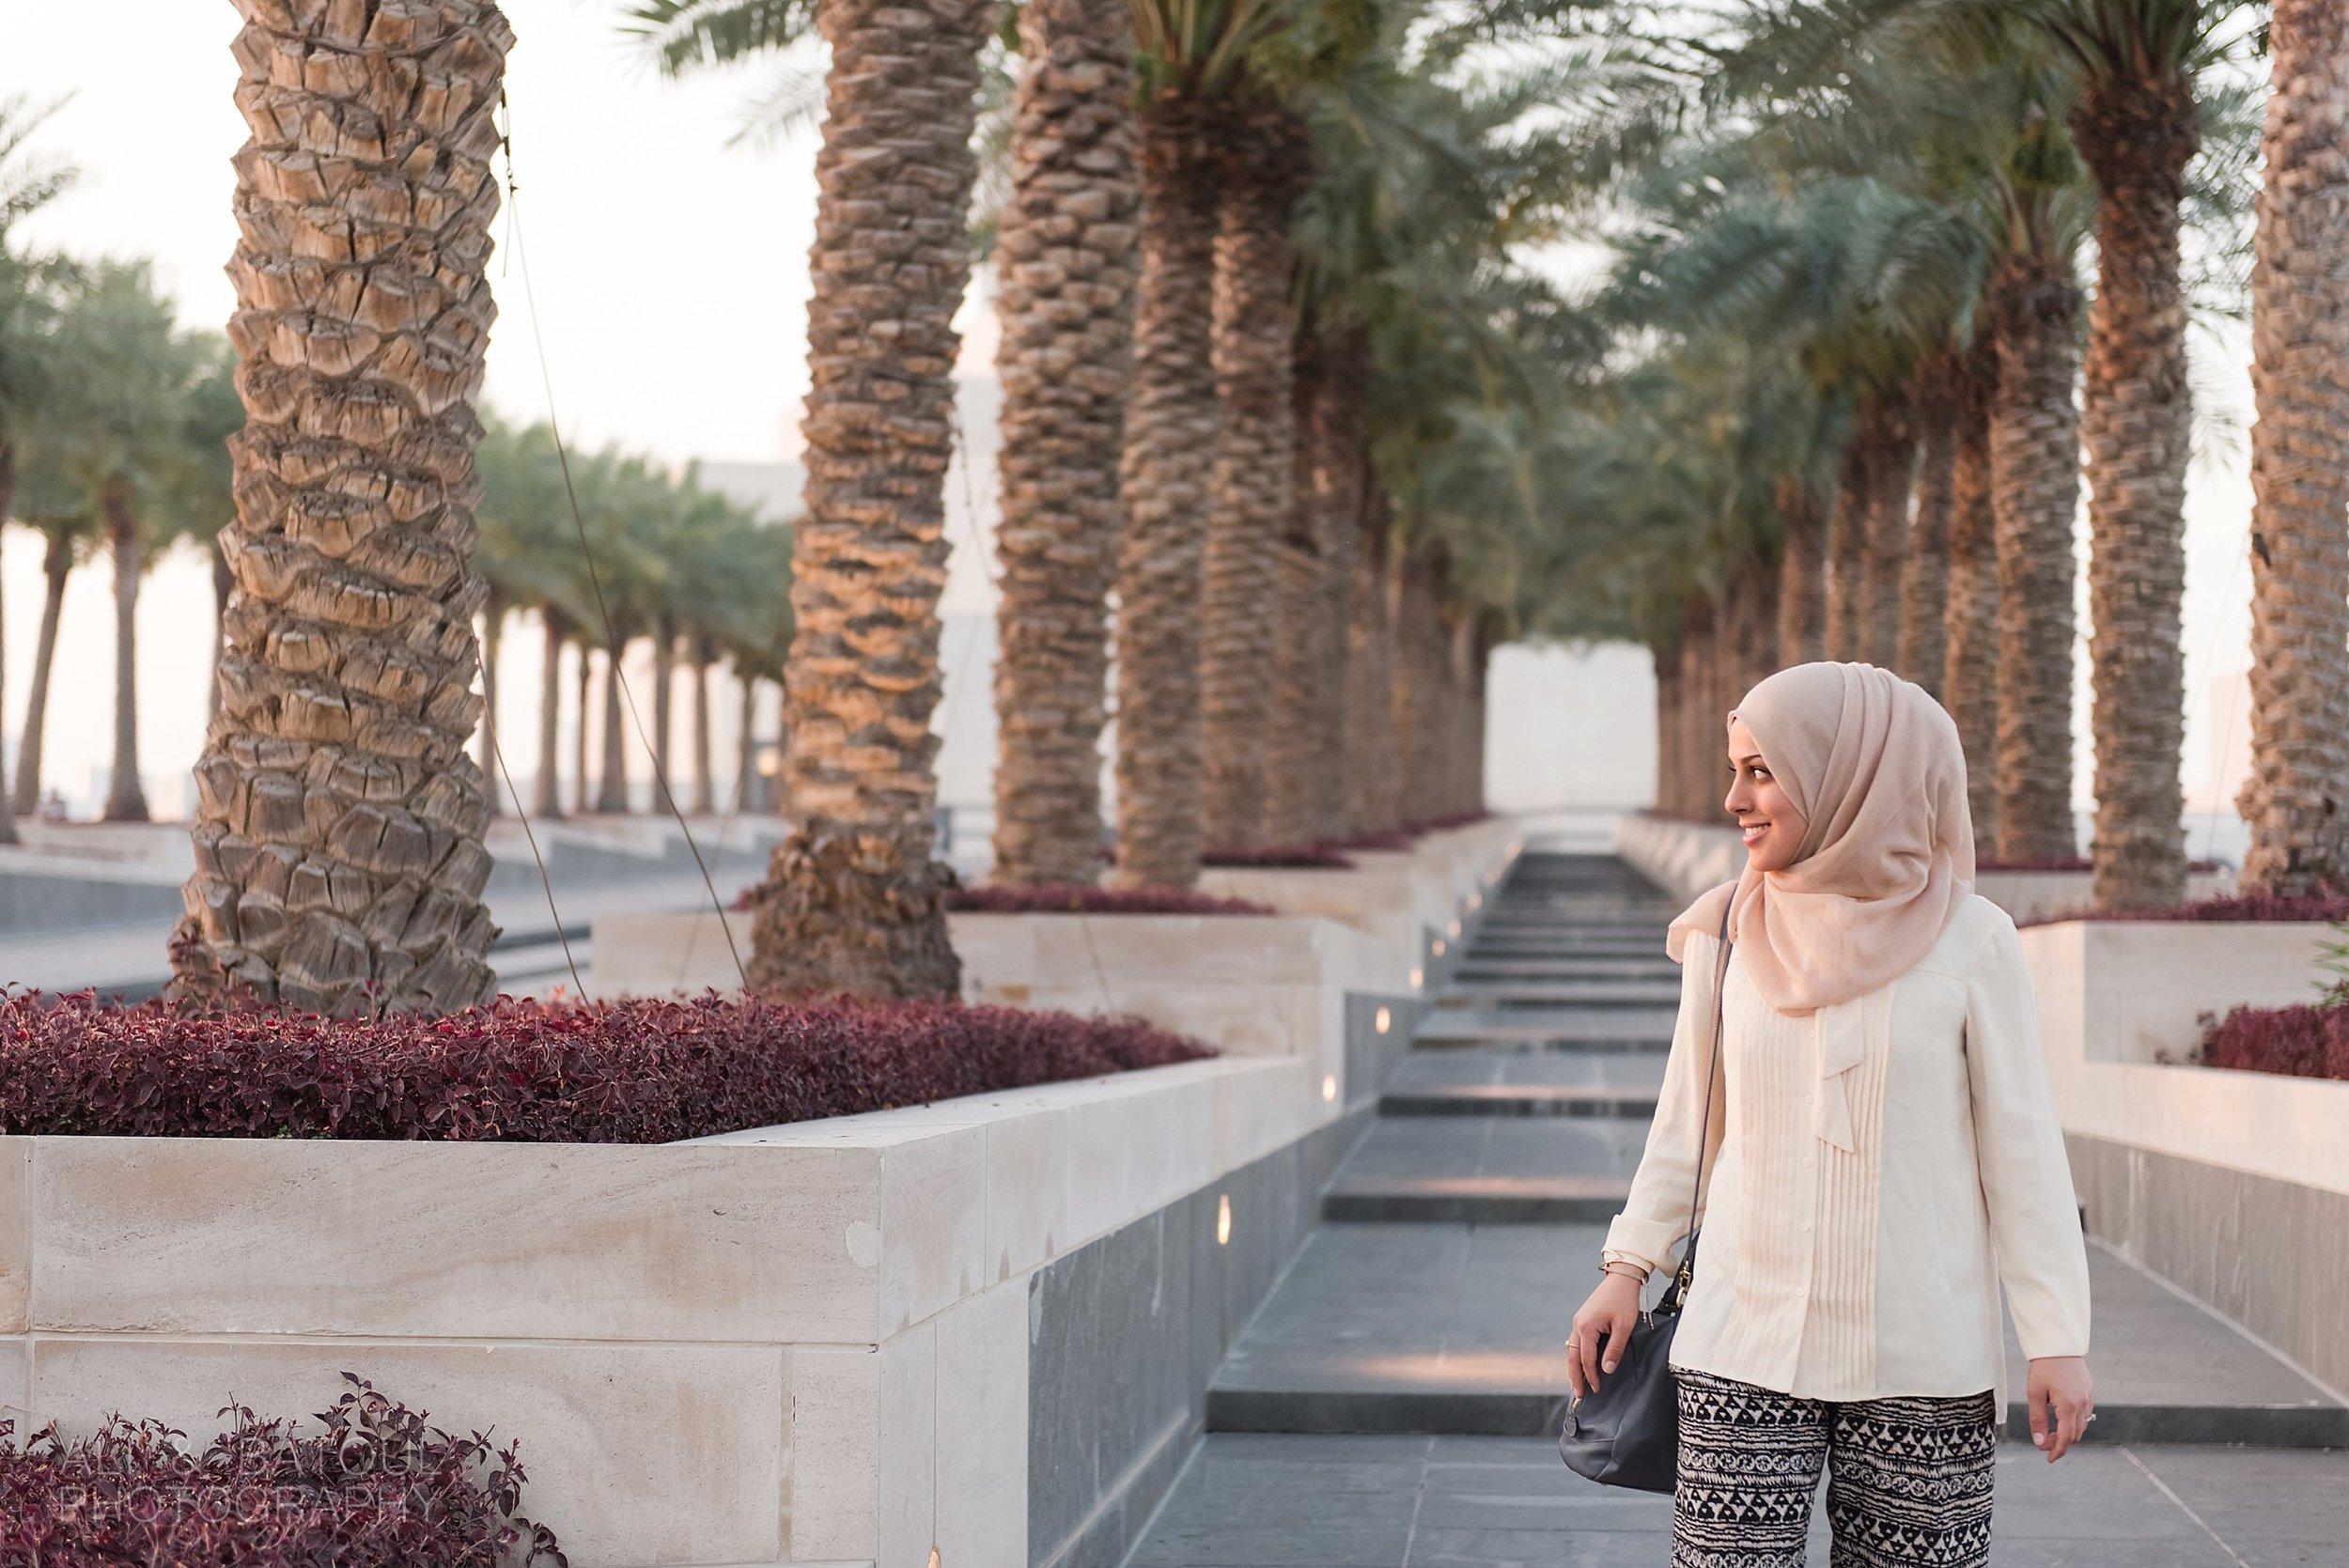 Ali & Batoul Photography - Doha Travel Photography_0002.jpg